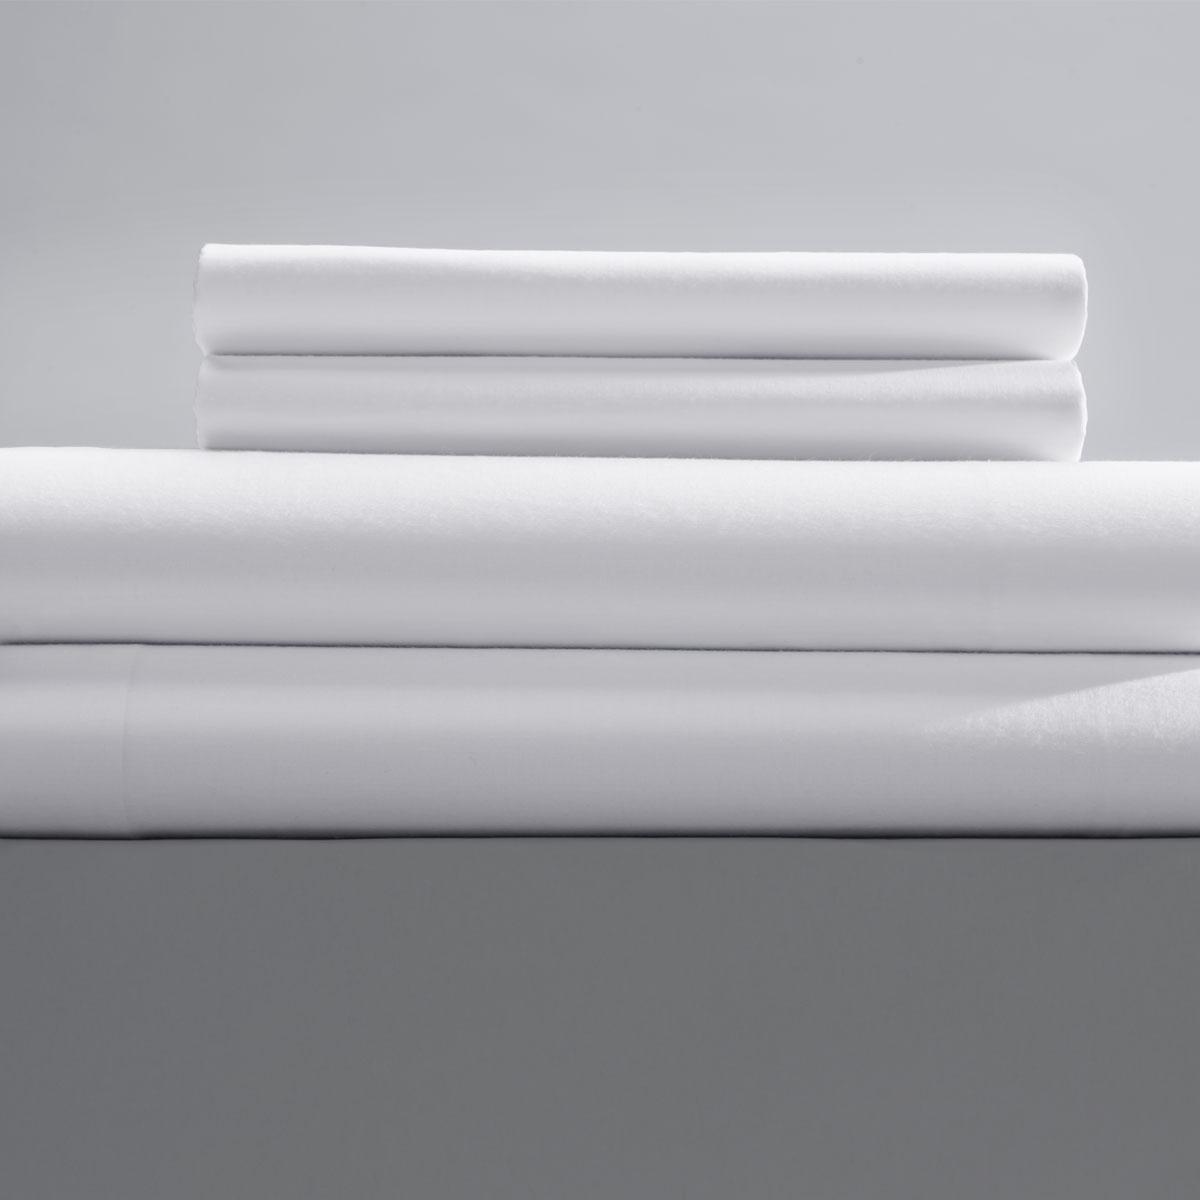 Braderie housse de couette blanche standard textile for Taille standard housse de couette